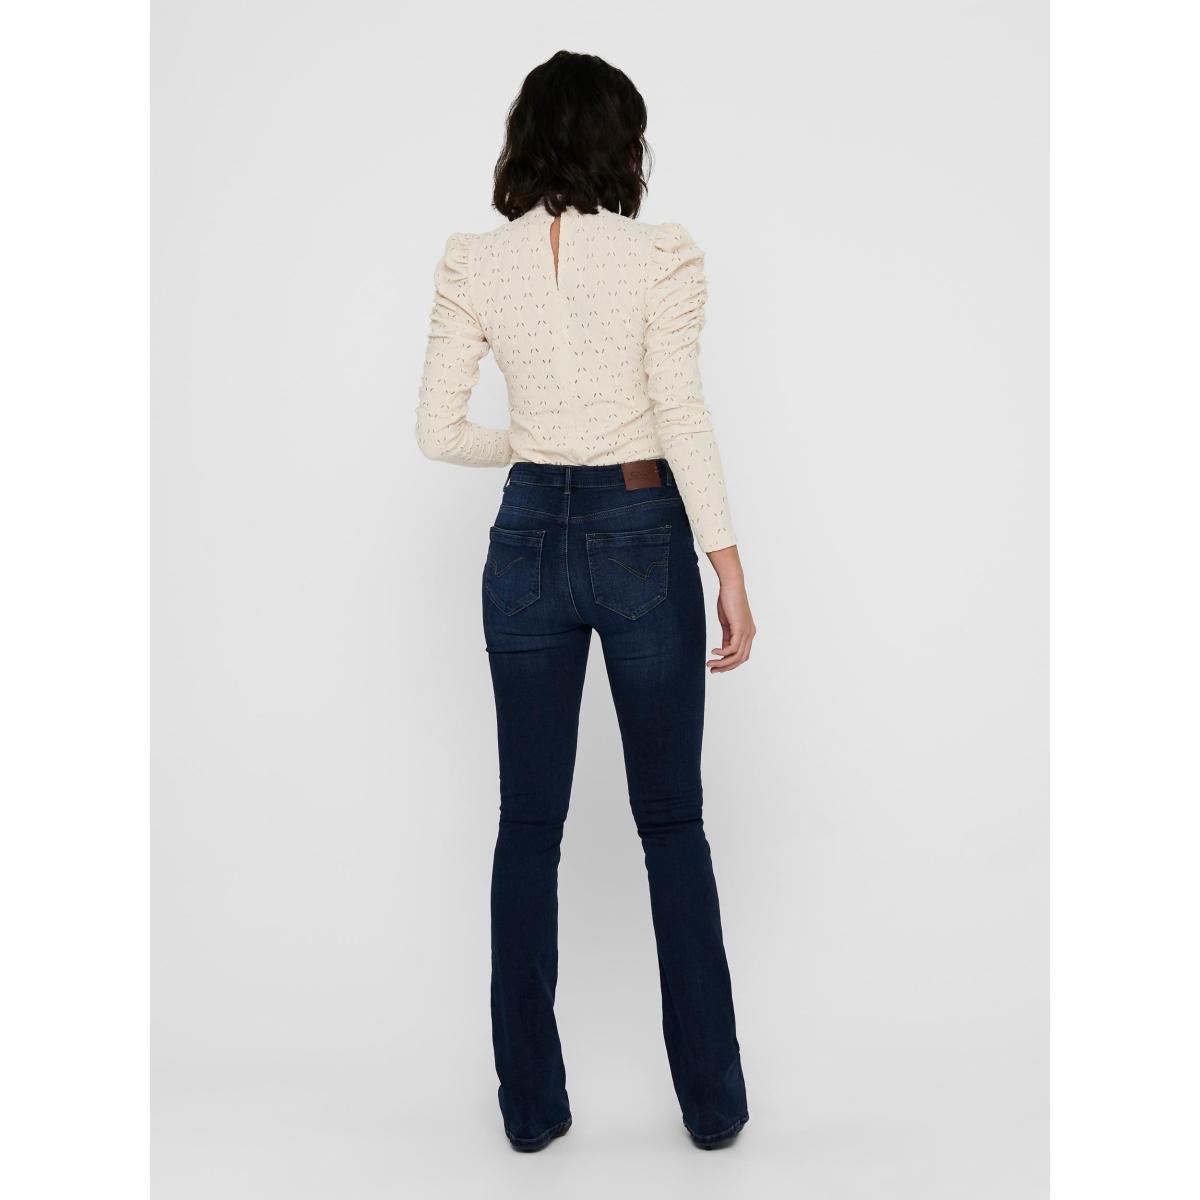 onlpaola hw flared bb jns azgz878 n 15170664 only jeans dark blue denim